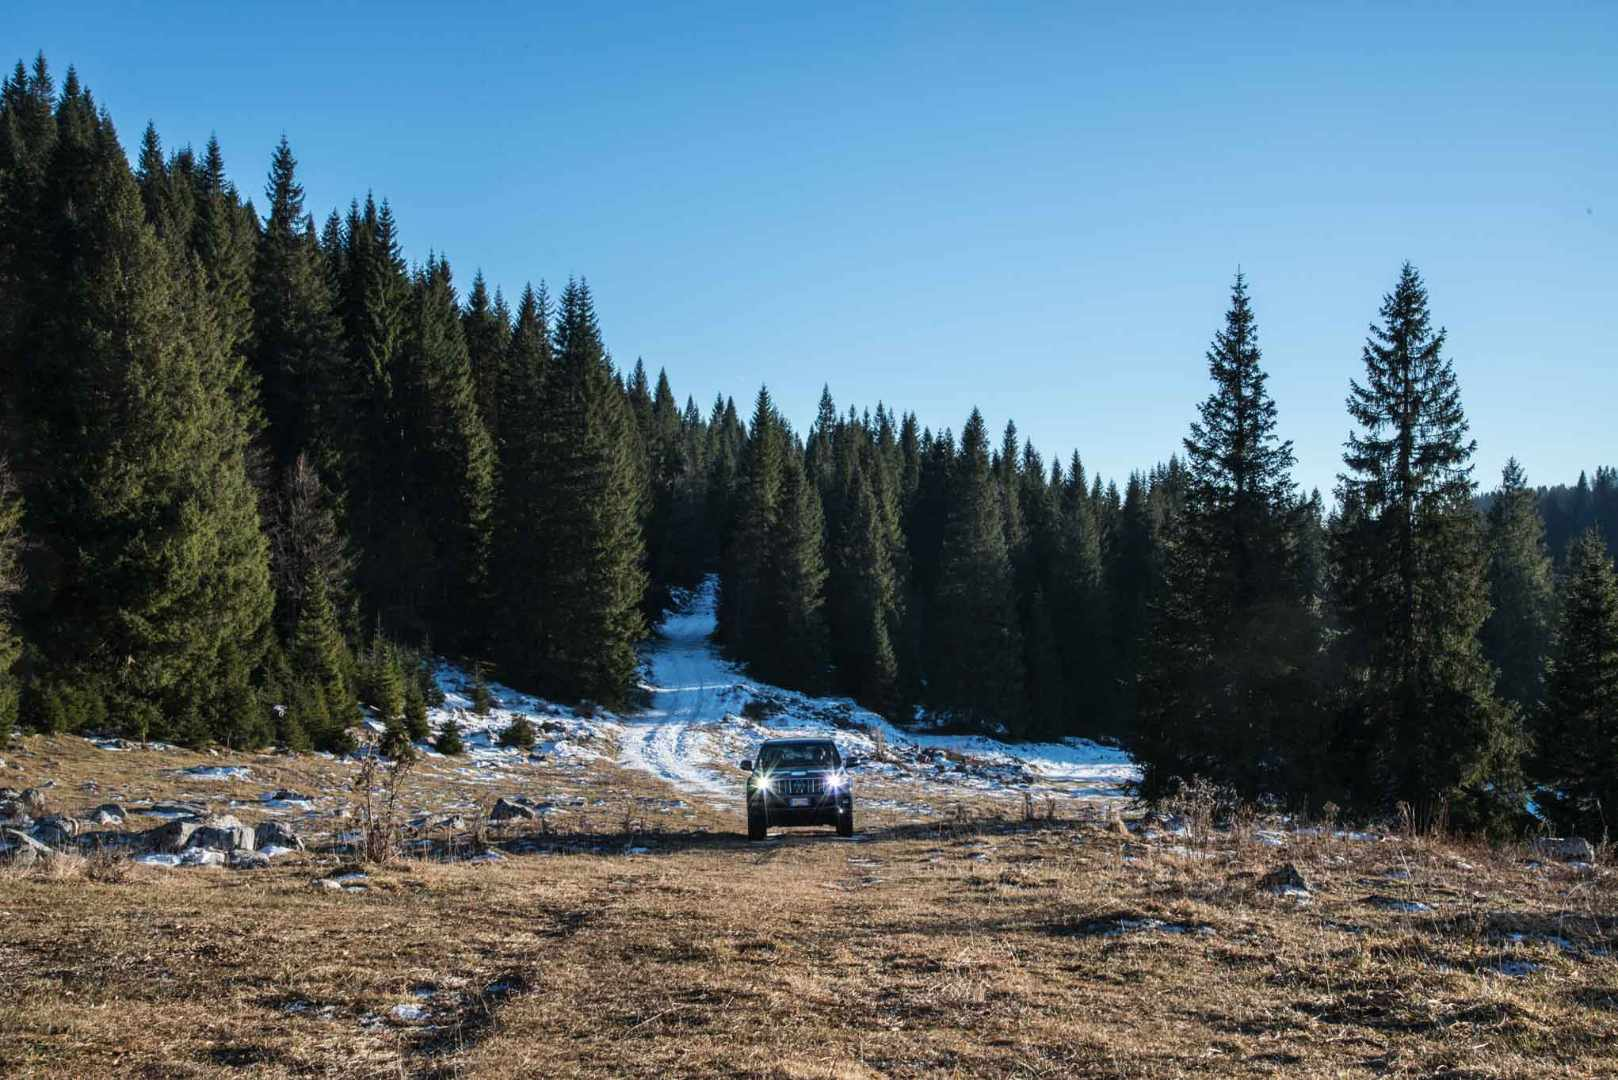 Escape On Wheels - Toyota Land Cruiser-10.jpg